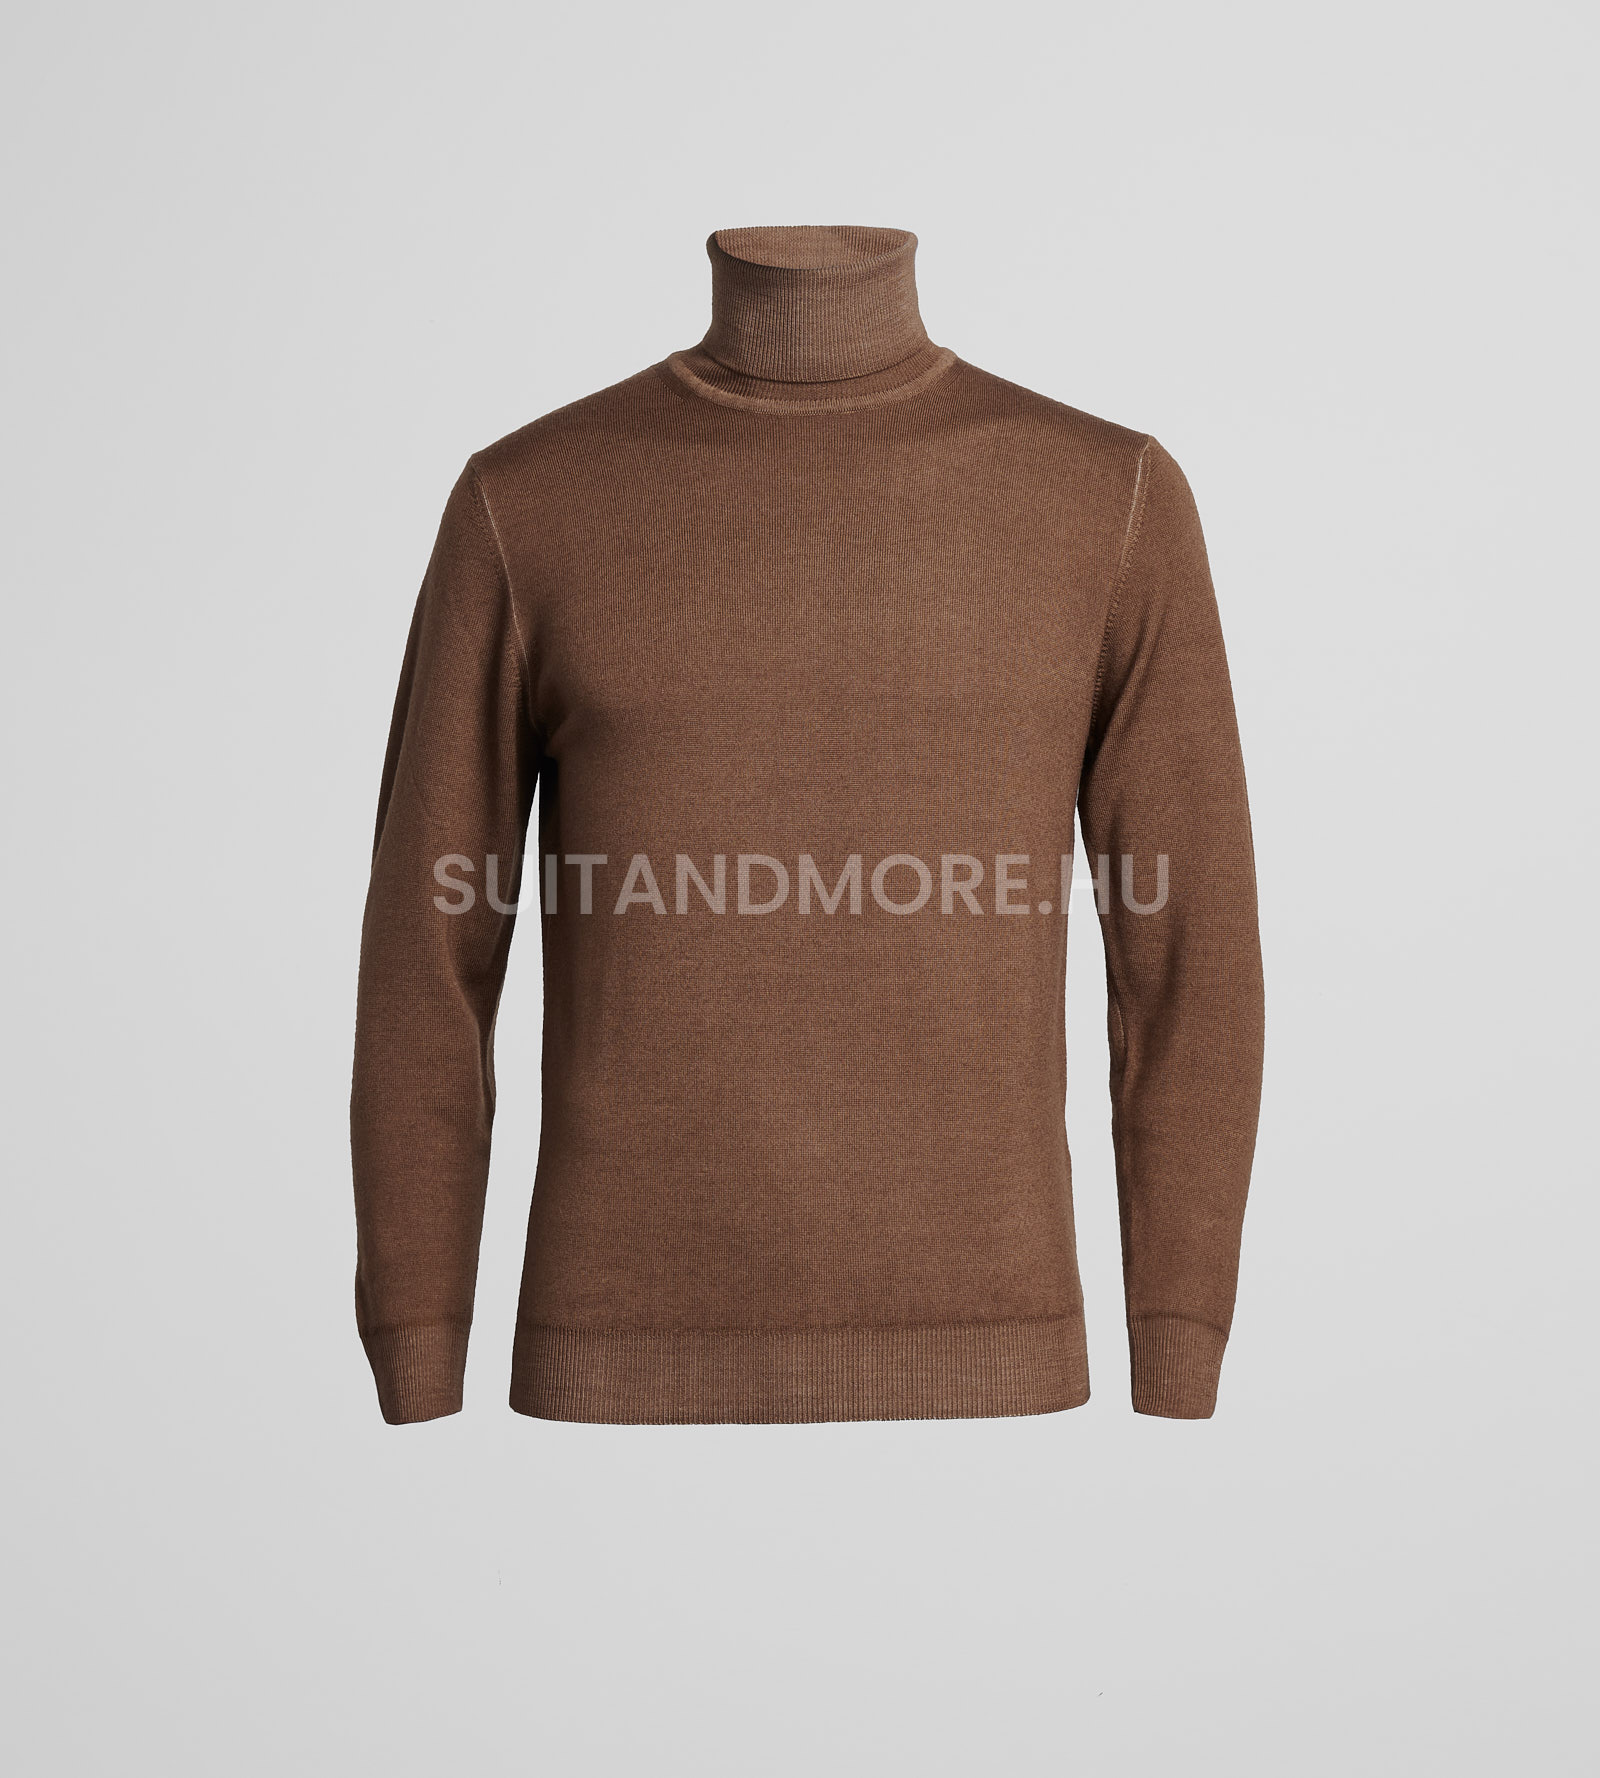 digel-barna-modern-fit-garbo-nyaku-gyapju-pulover-francis1-1-1288001-32-01